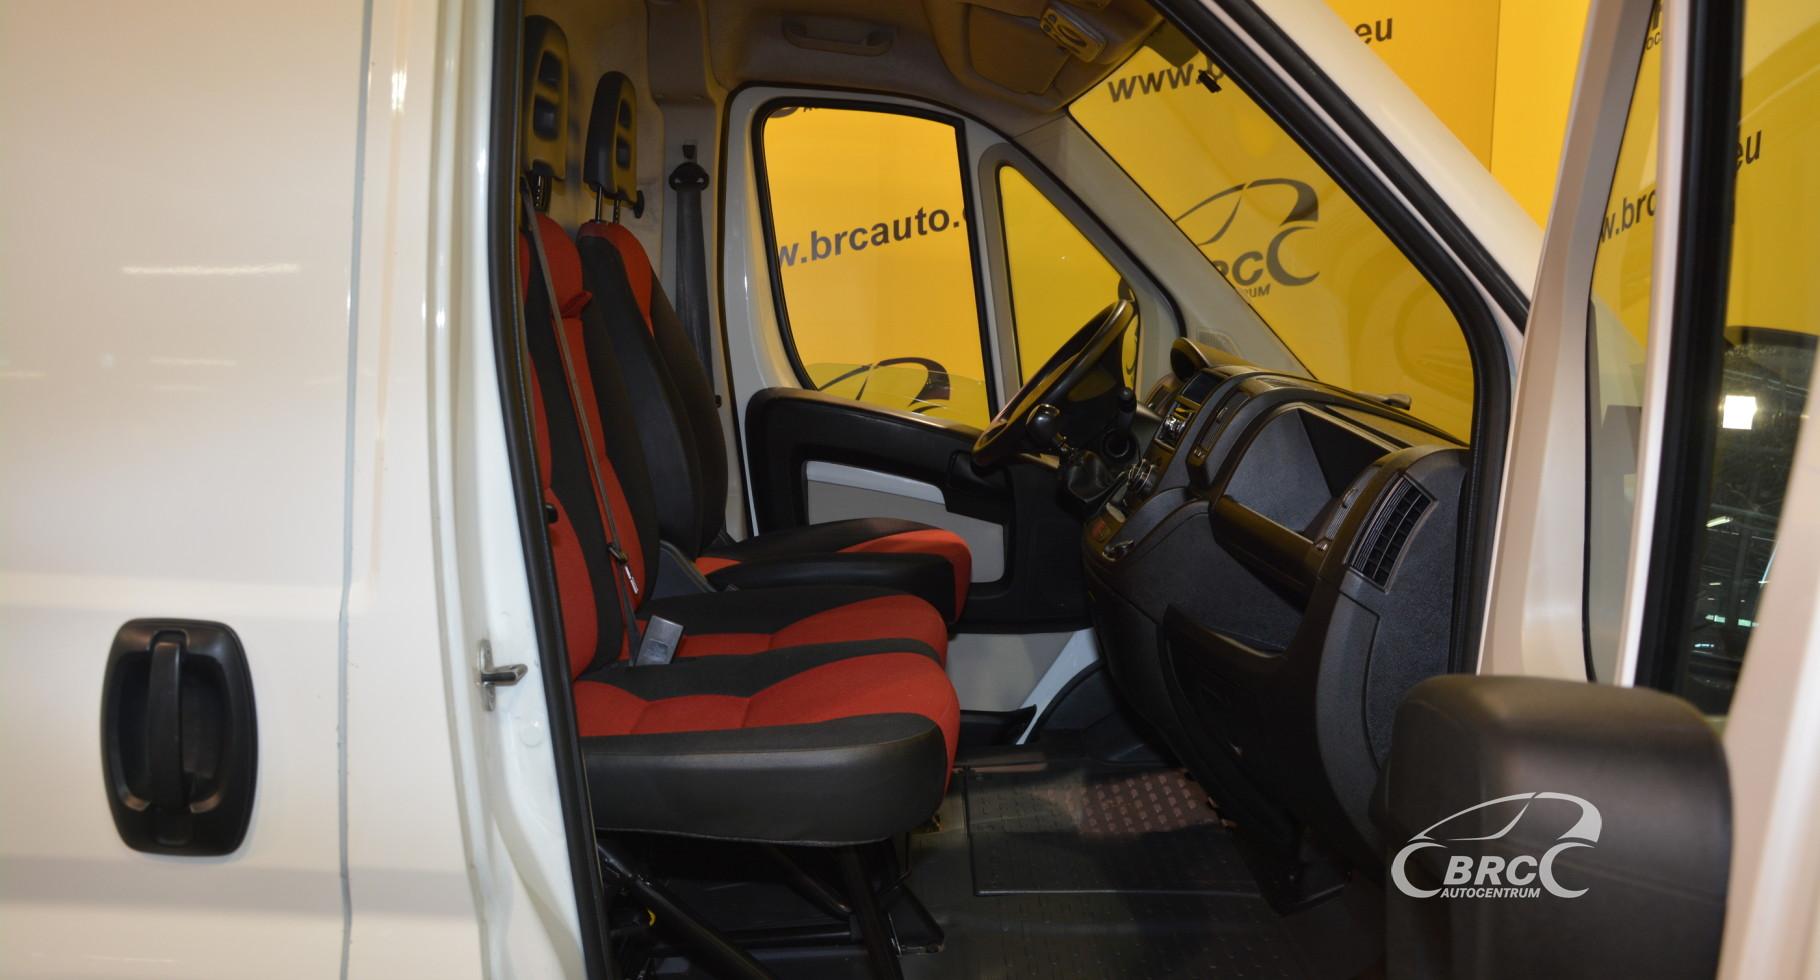 fiat ducato 2 3 hdi maxi 150 multijet id 794979 brc autocentras. Black Bedroom Furniture Sets. Home Design Ideas